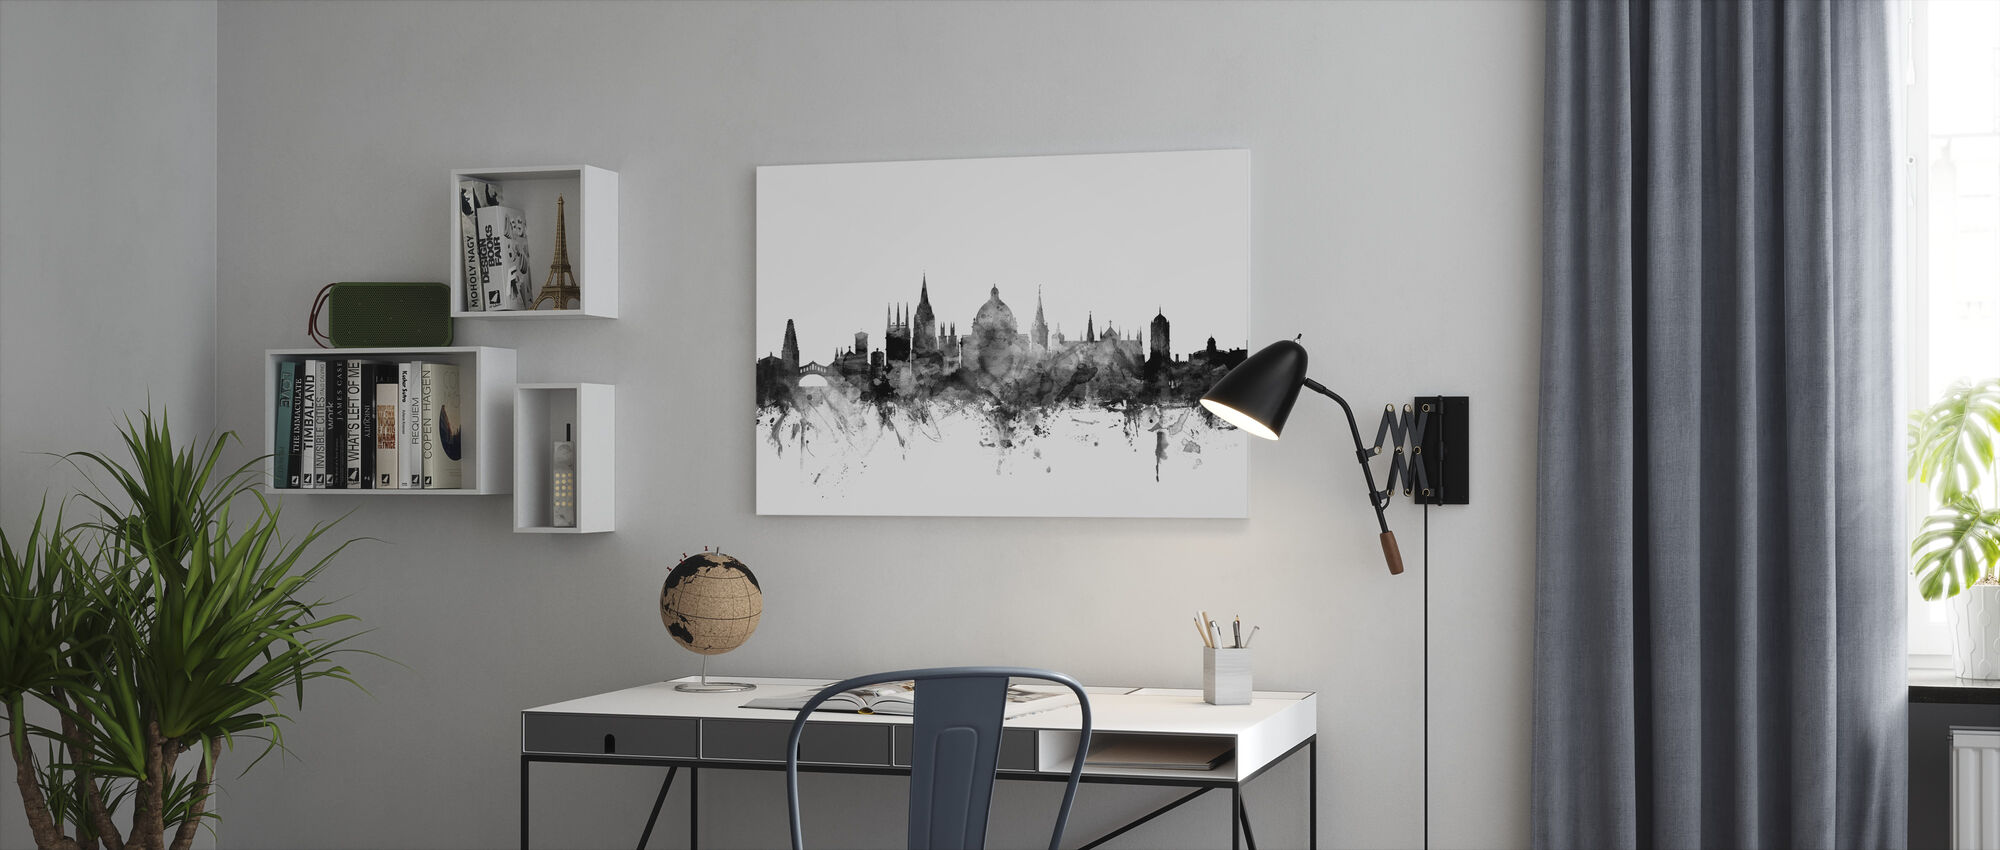 Oxford UK Skyline Black - Canvas print - Office